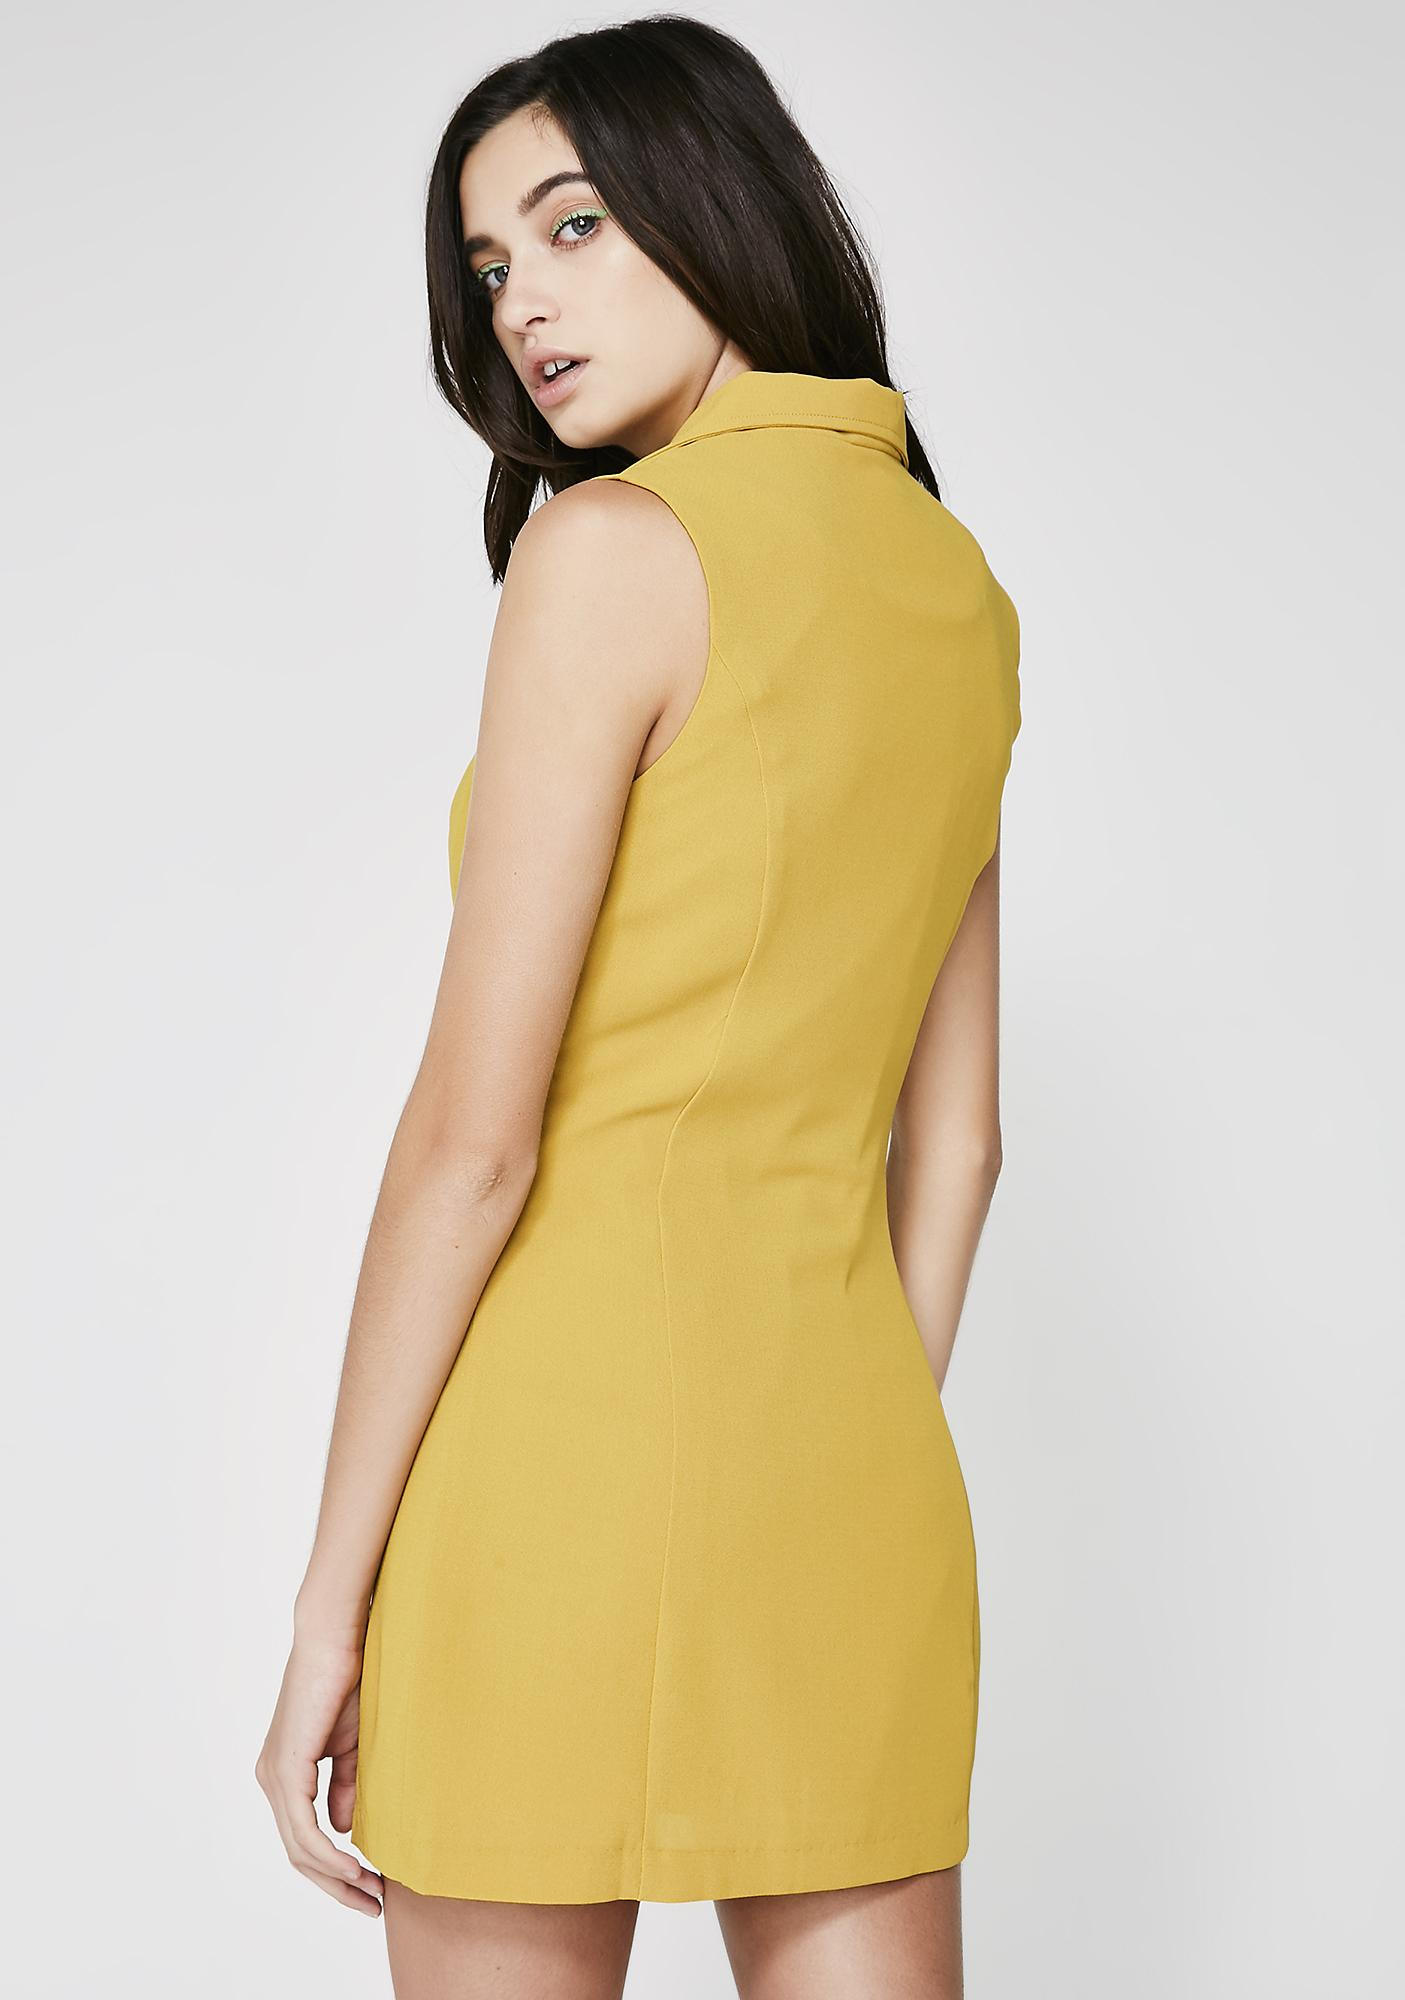 Letz Talk Bizness Notch Dress